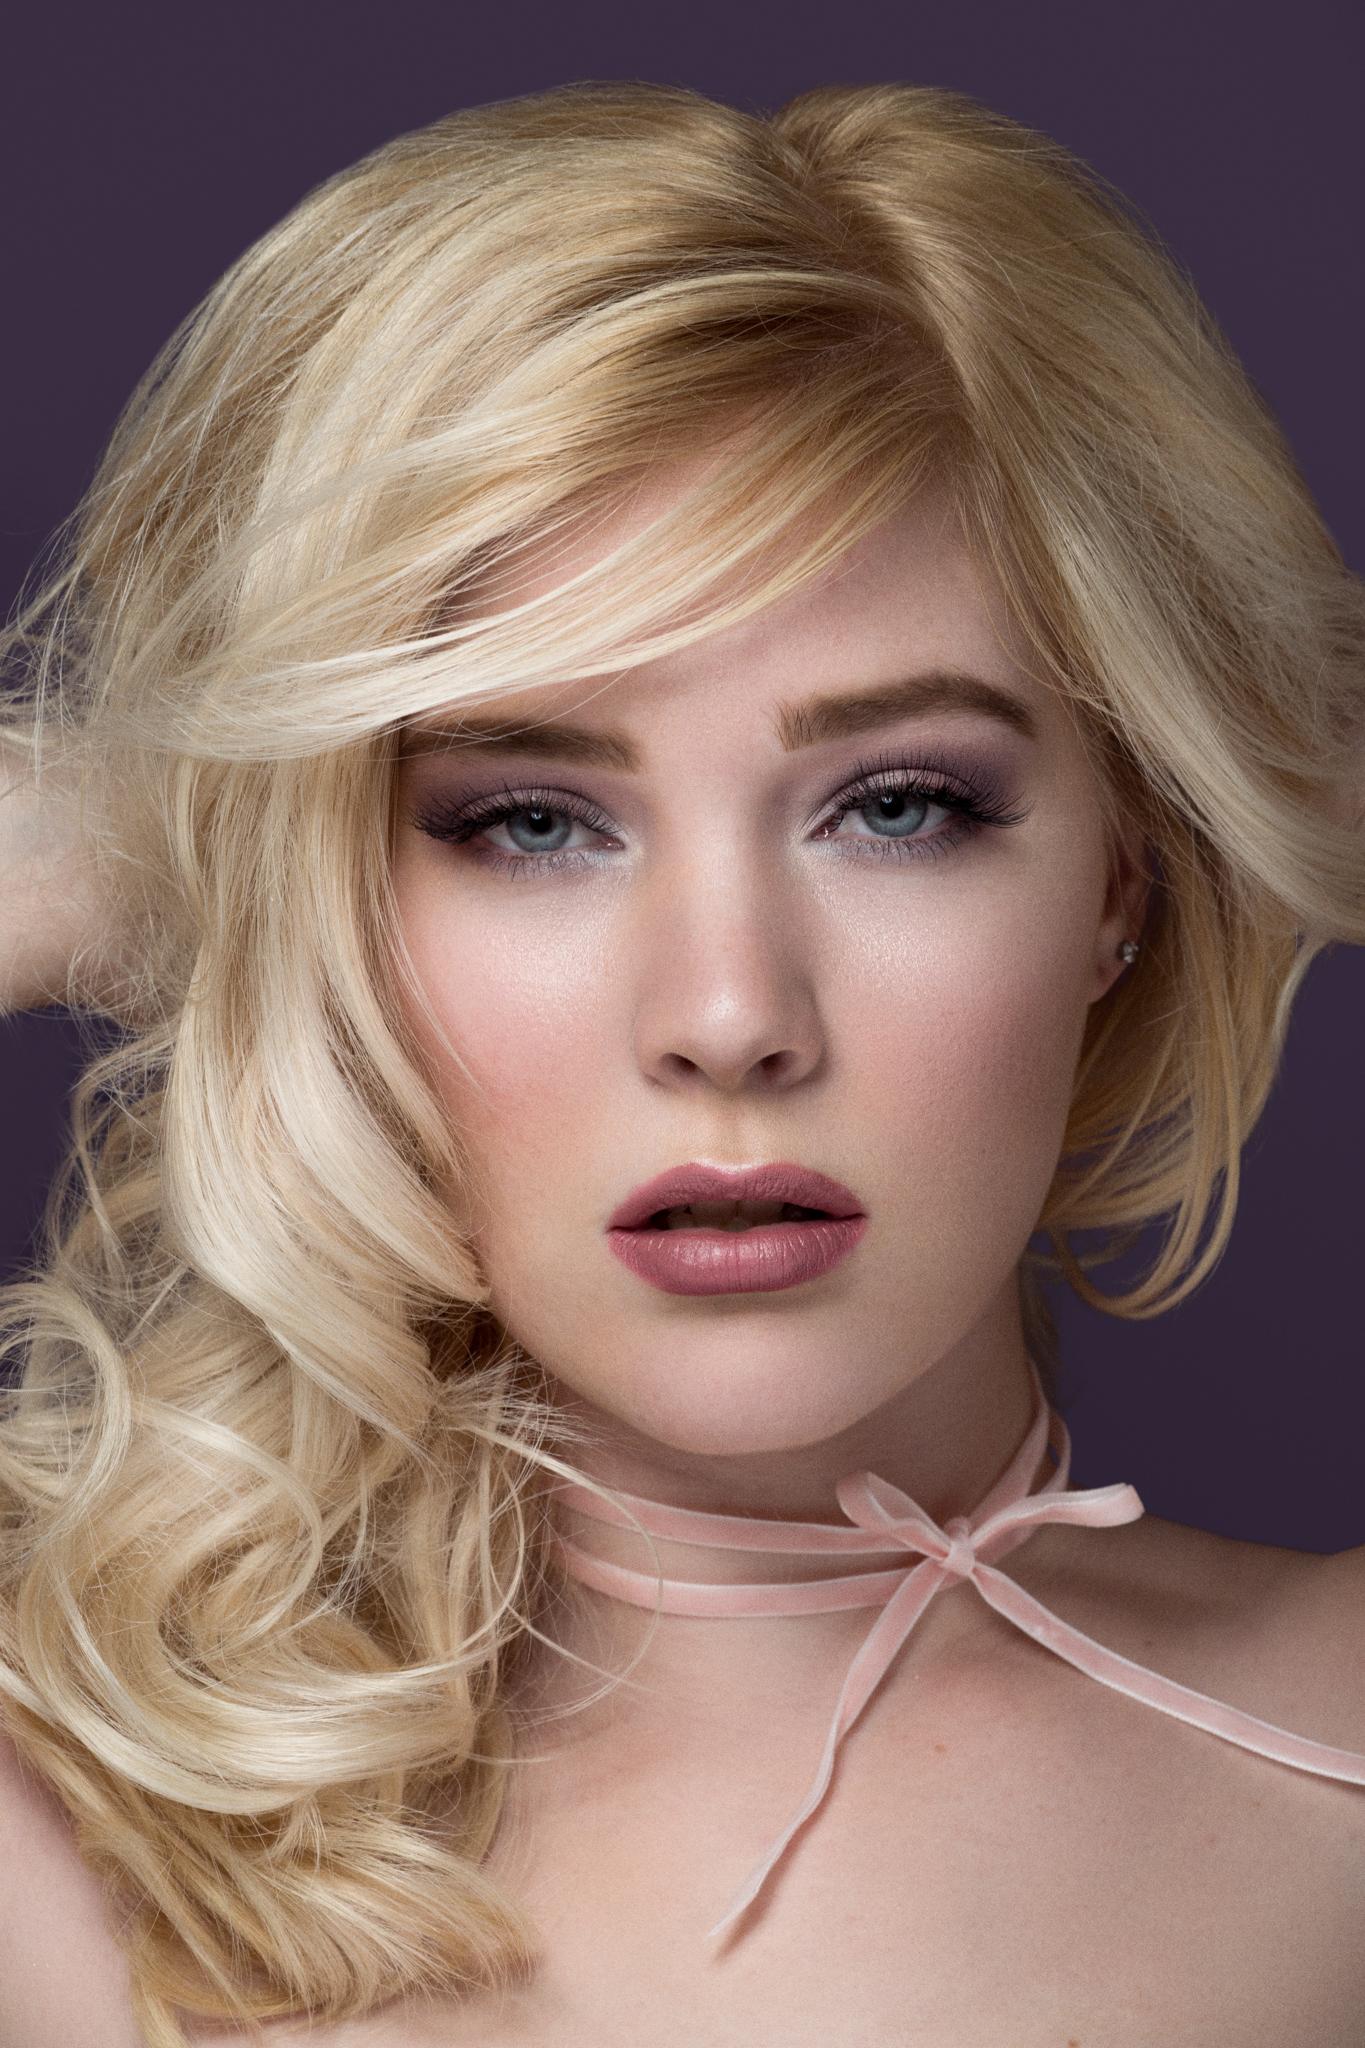 170125_Los Angeles Beauty & Product Photographer_2017-01-25 Katie Phillips_IMG_0176-Edit.jpg